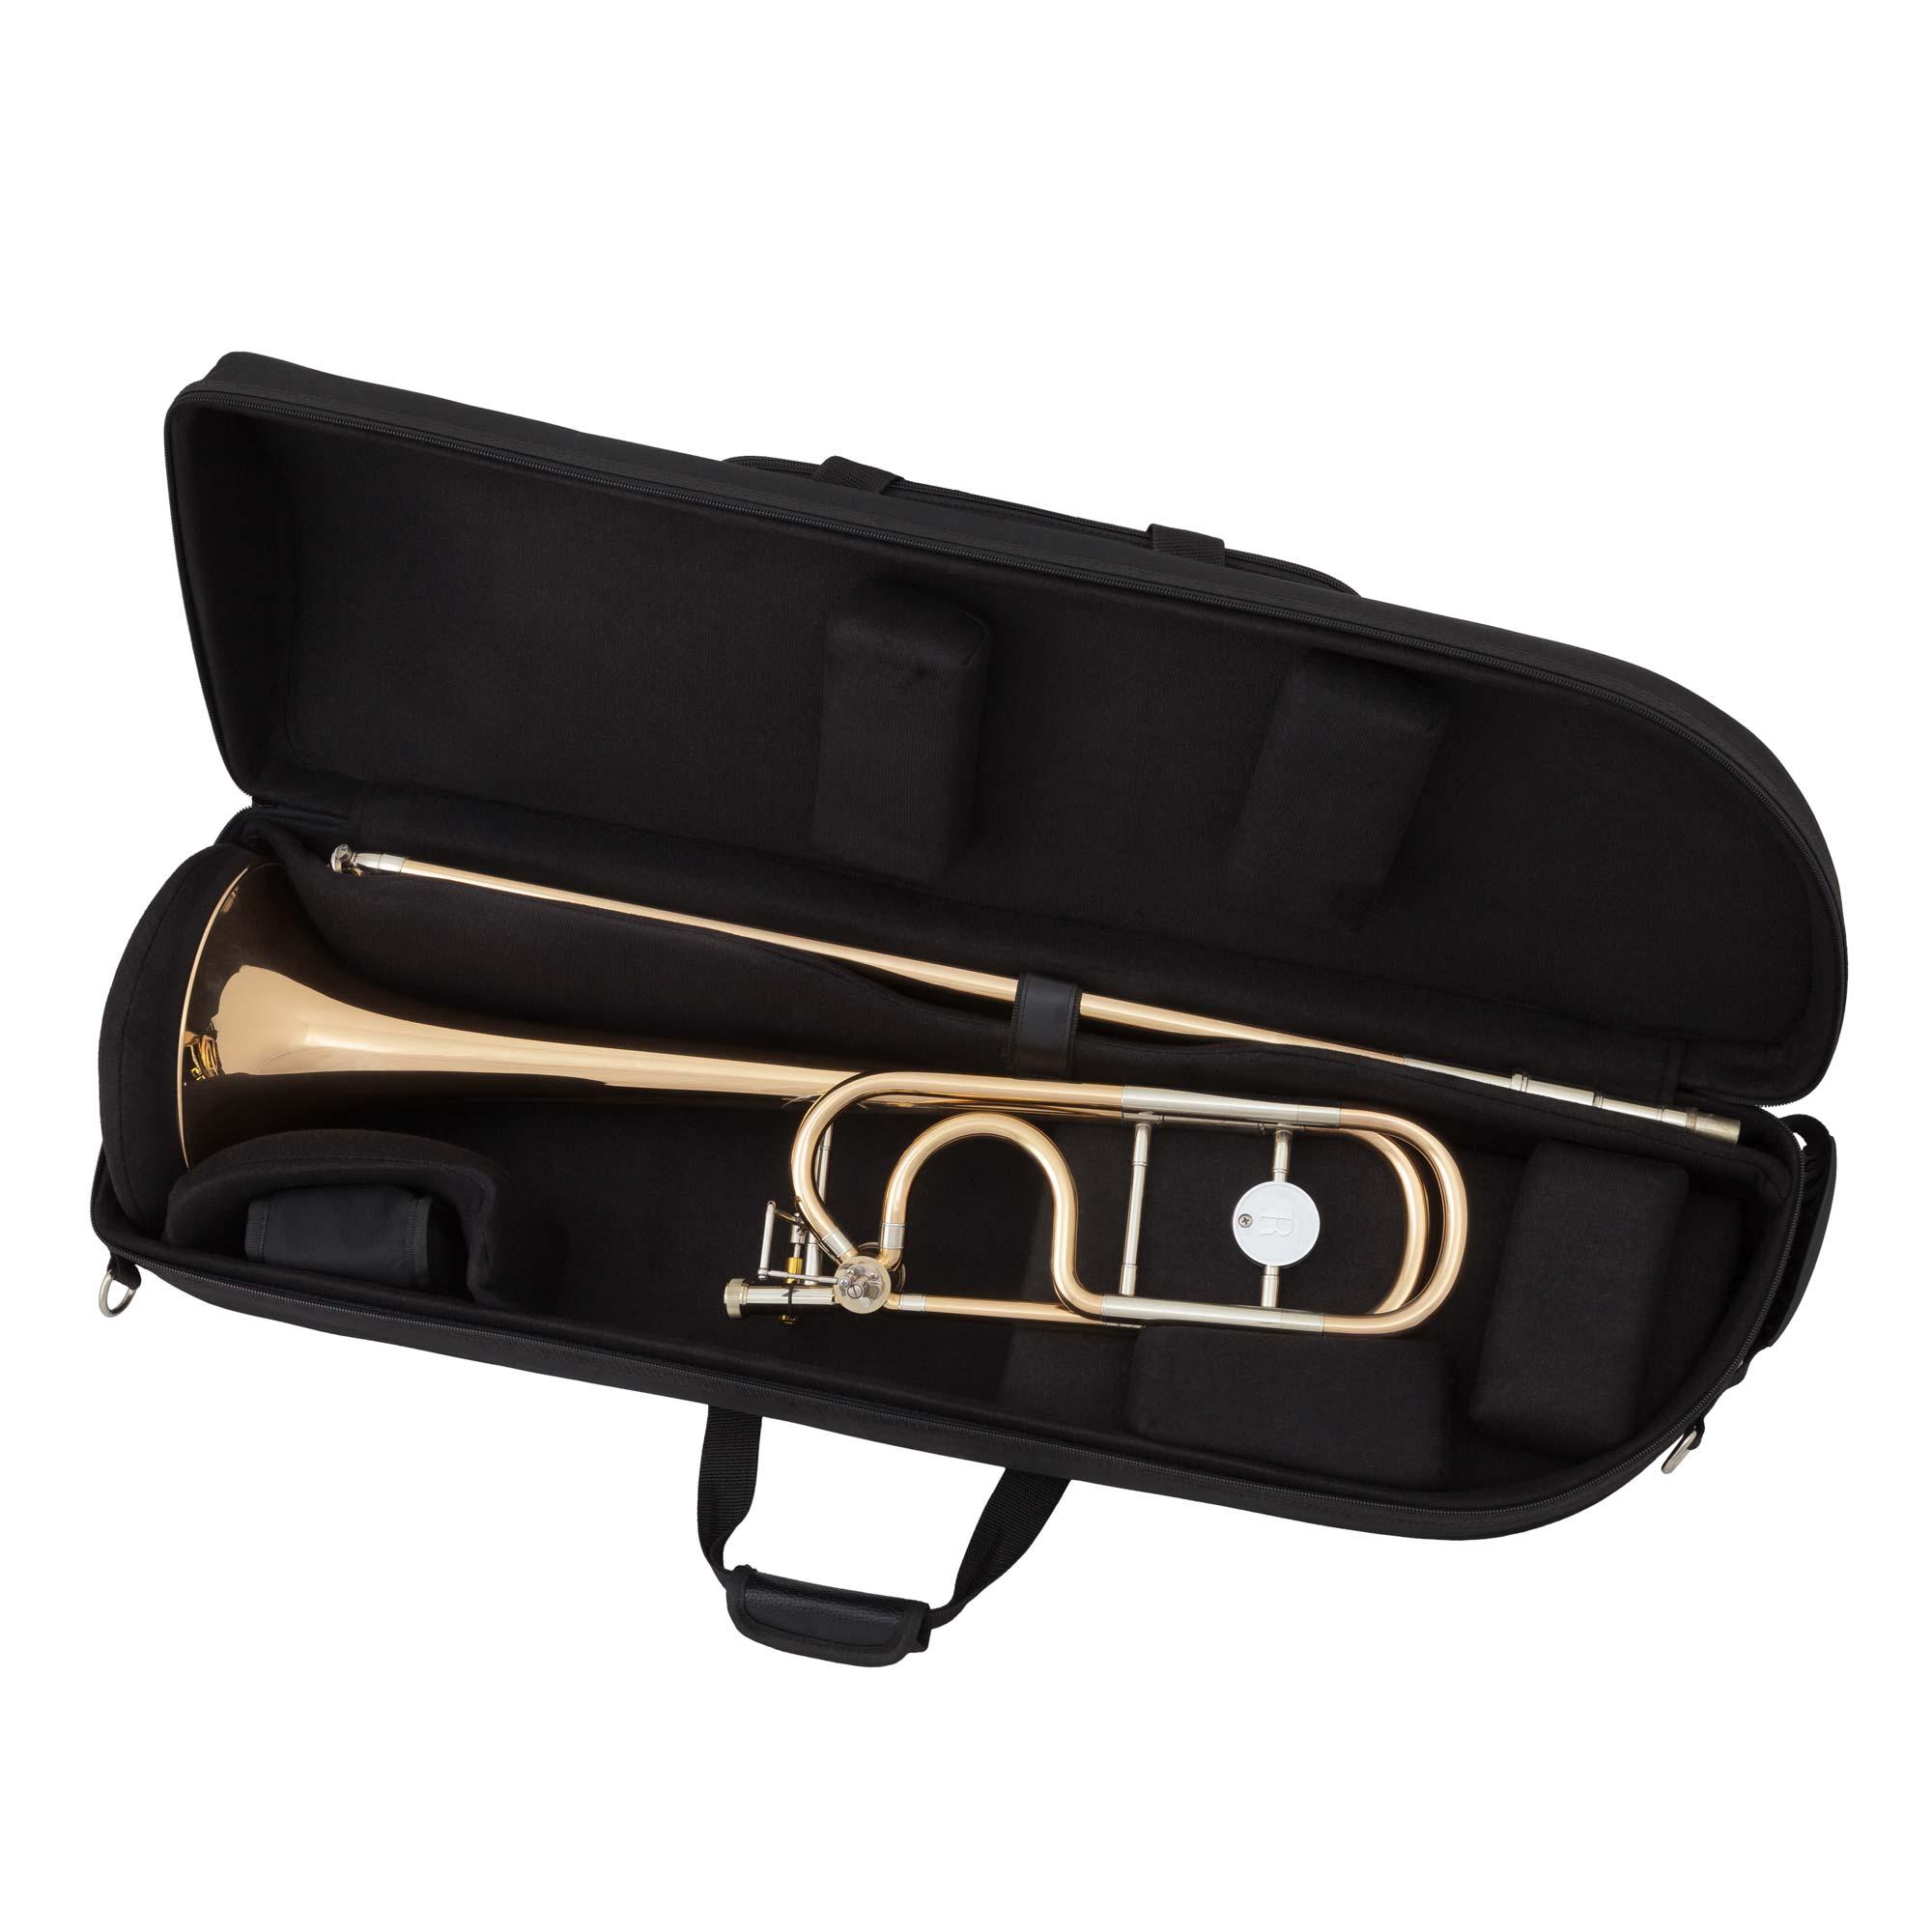 JP-Universal-Lightweight-trombone-case-IN-CASE-SHOT